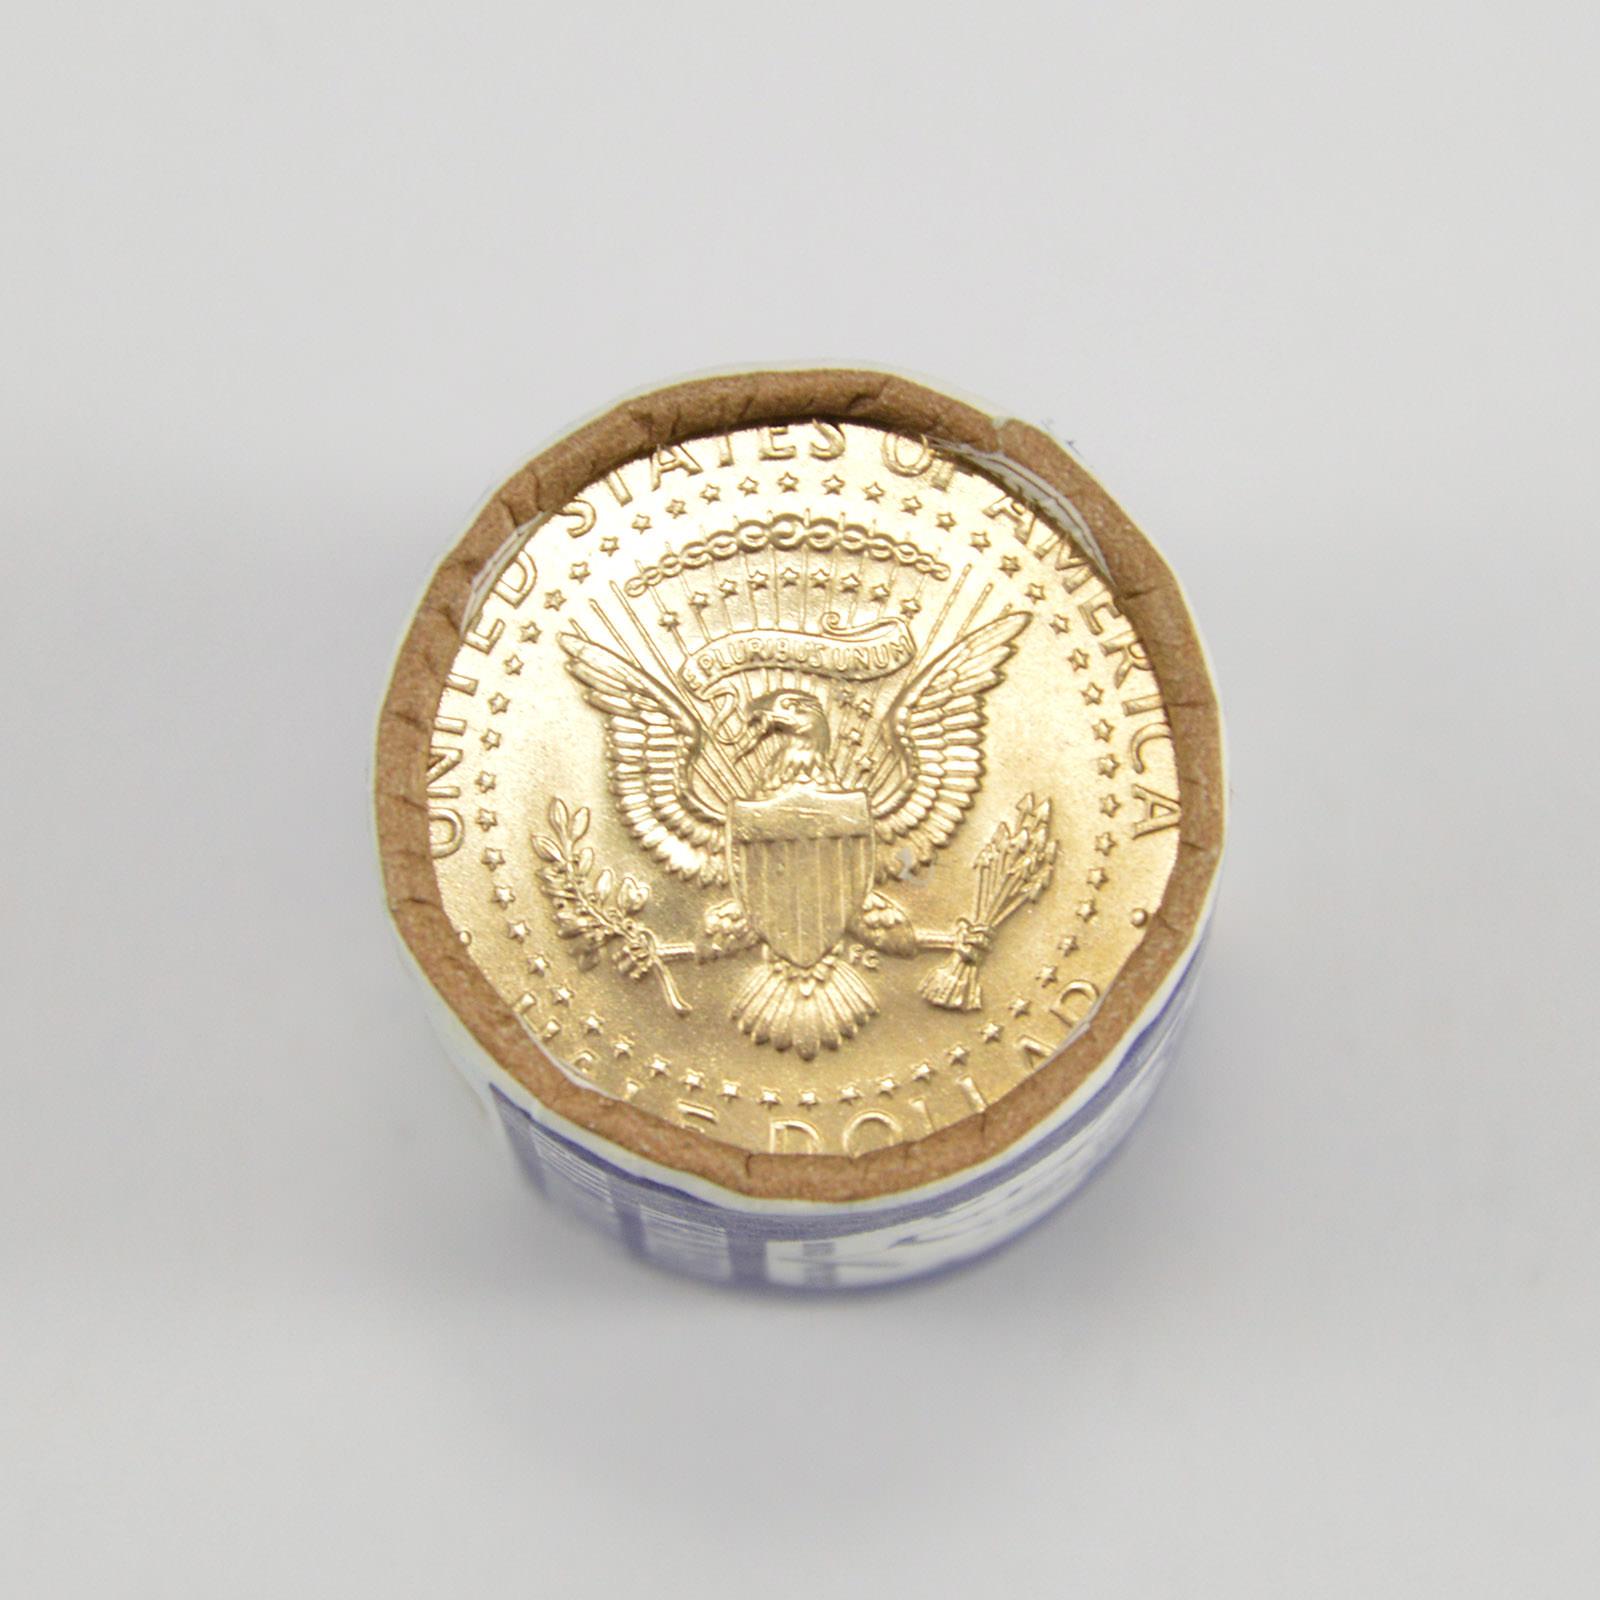 2002 D Kennedy Half Dollar ~ U.S Coin from Mint Roll